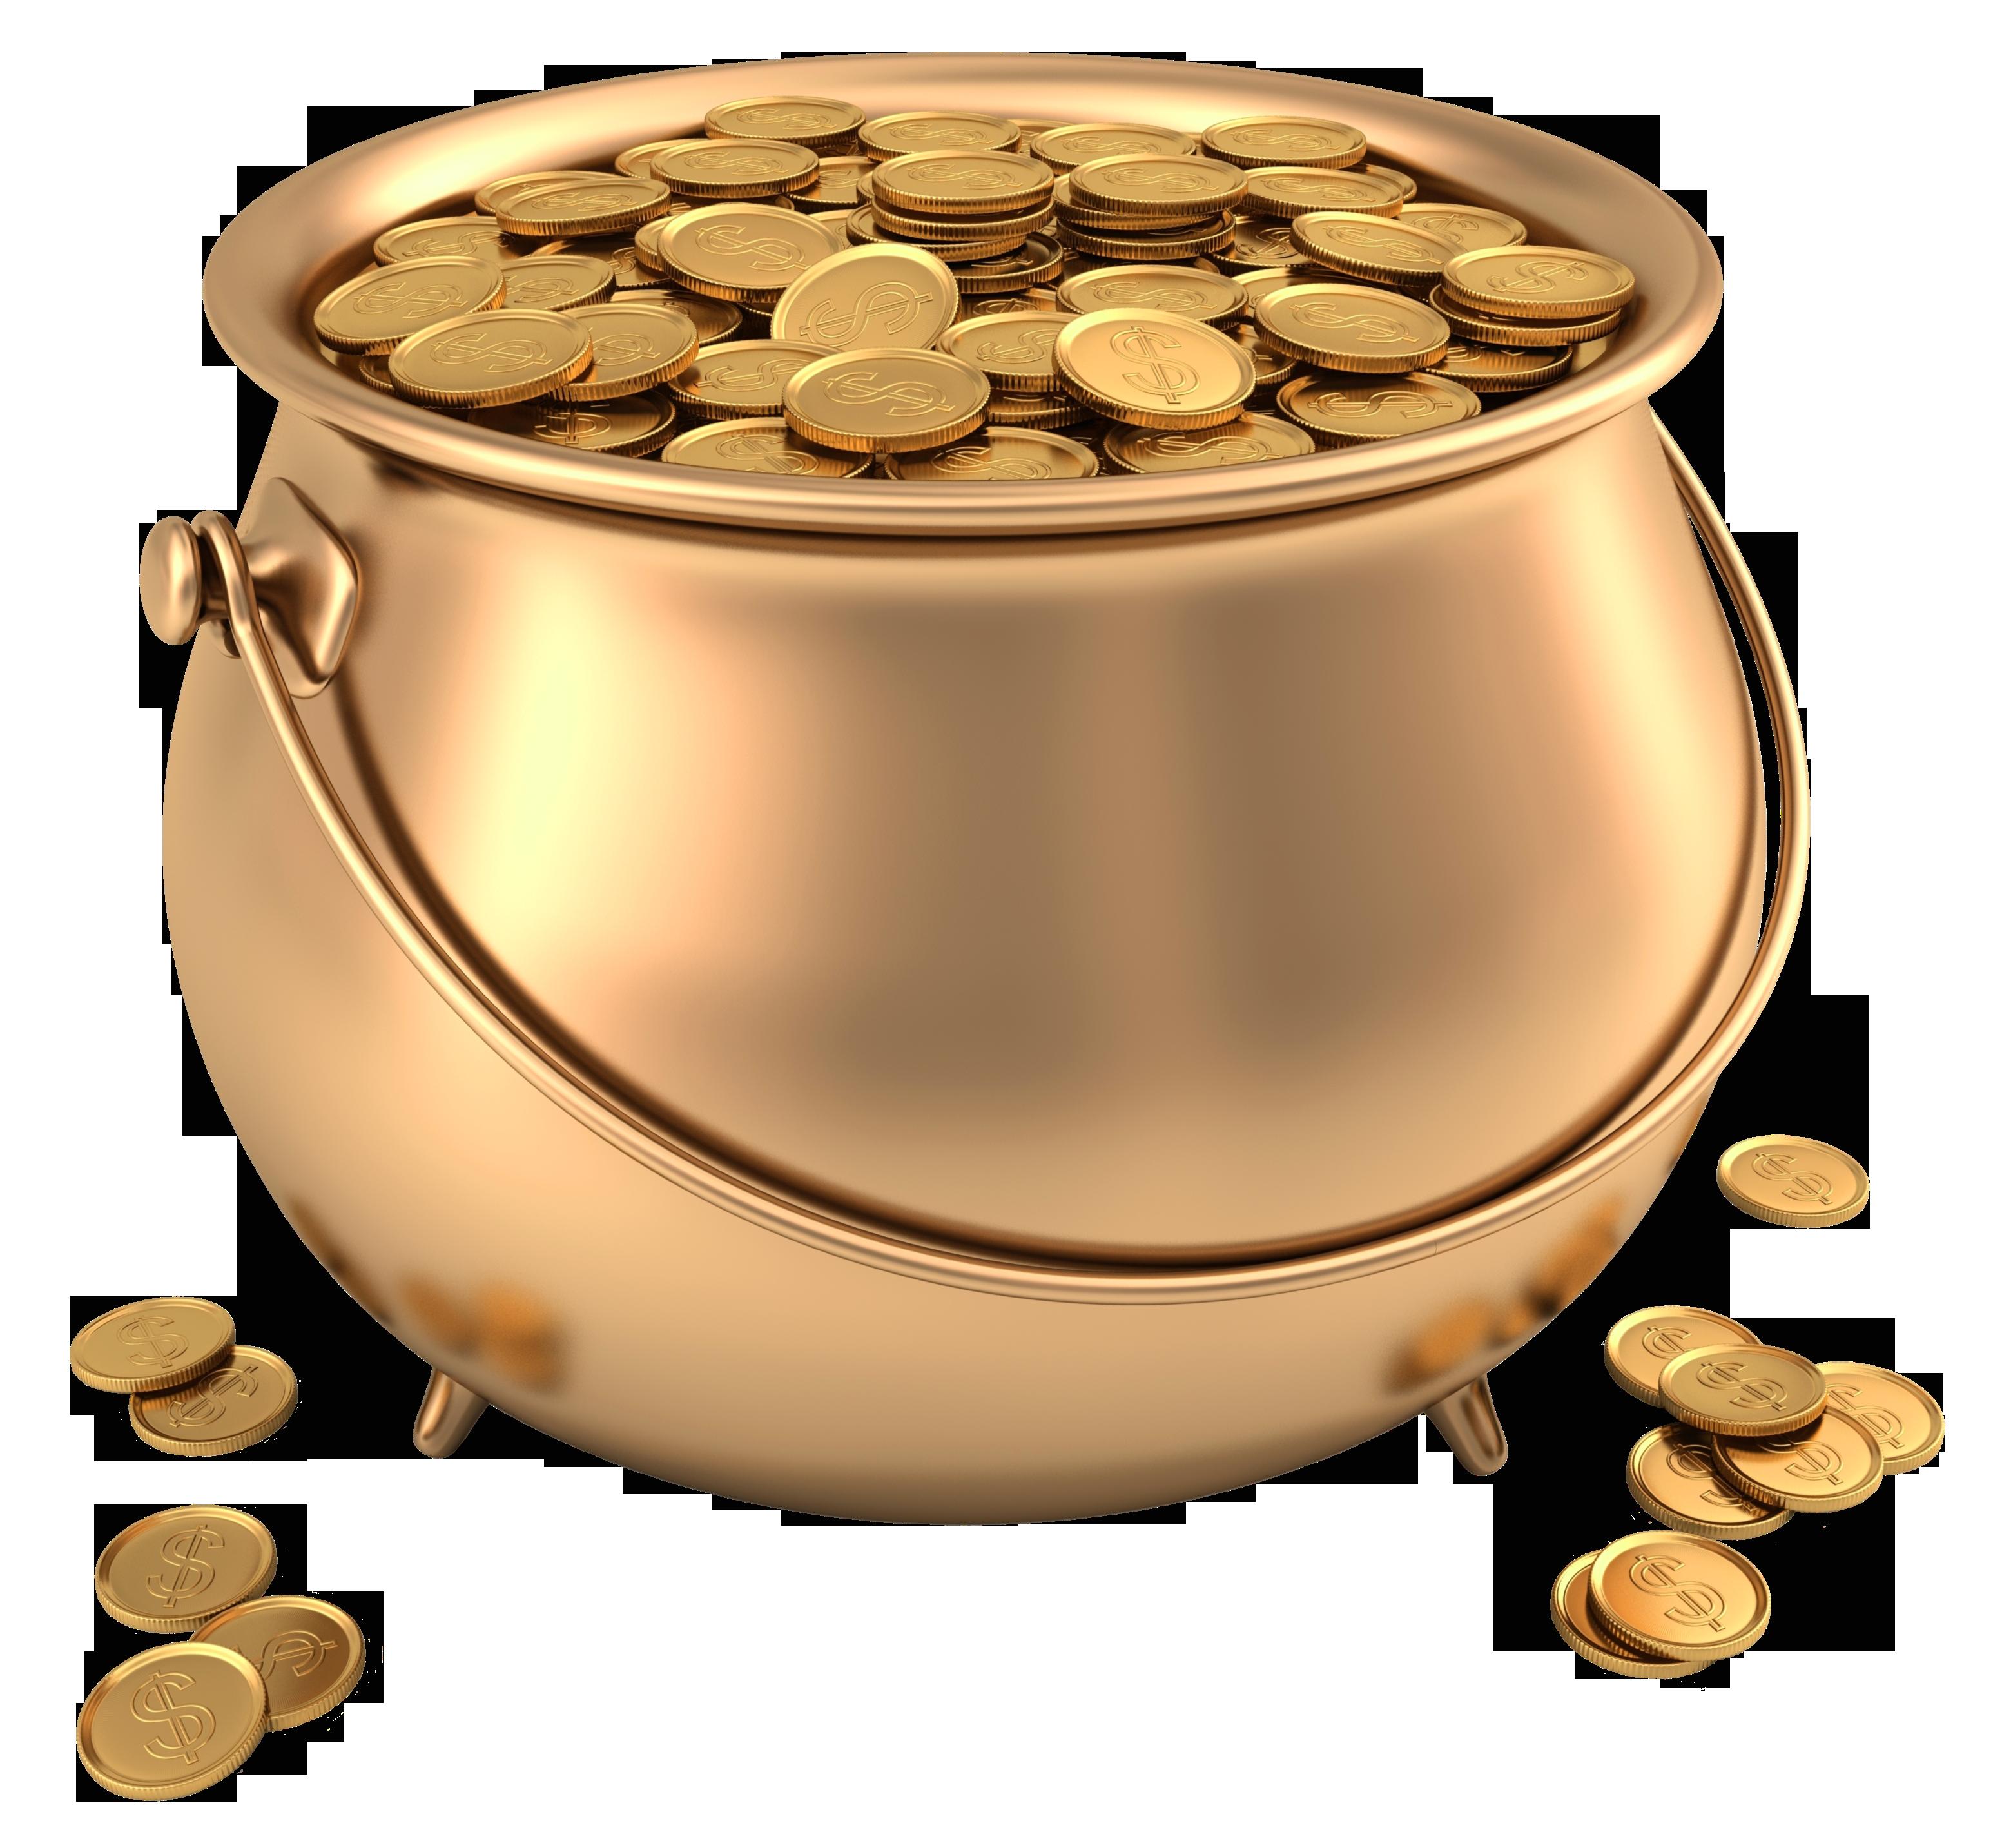 Treasure clipart golden. Image of pot gold